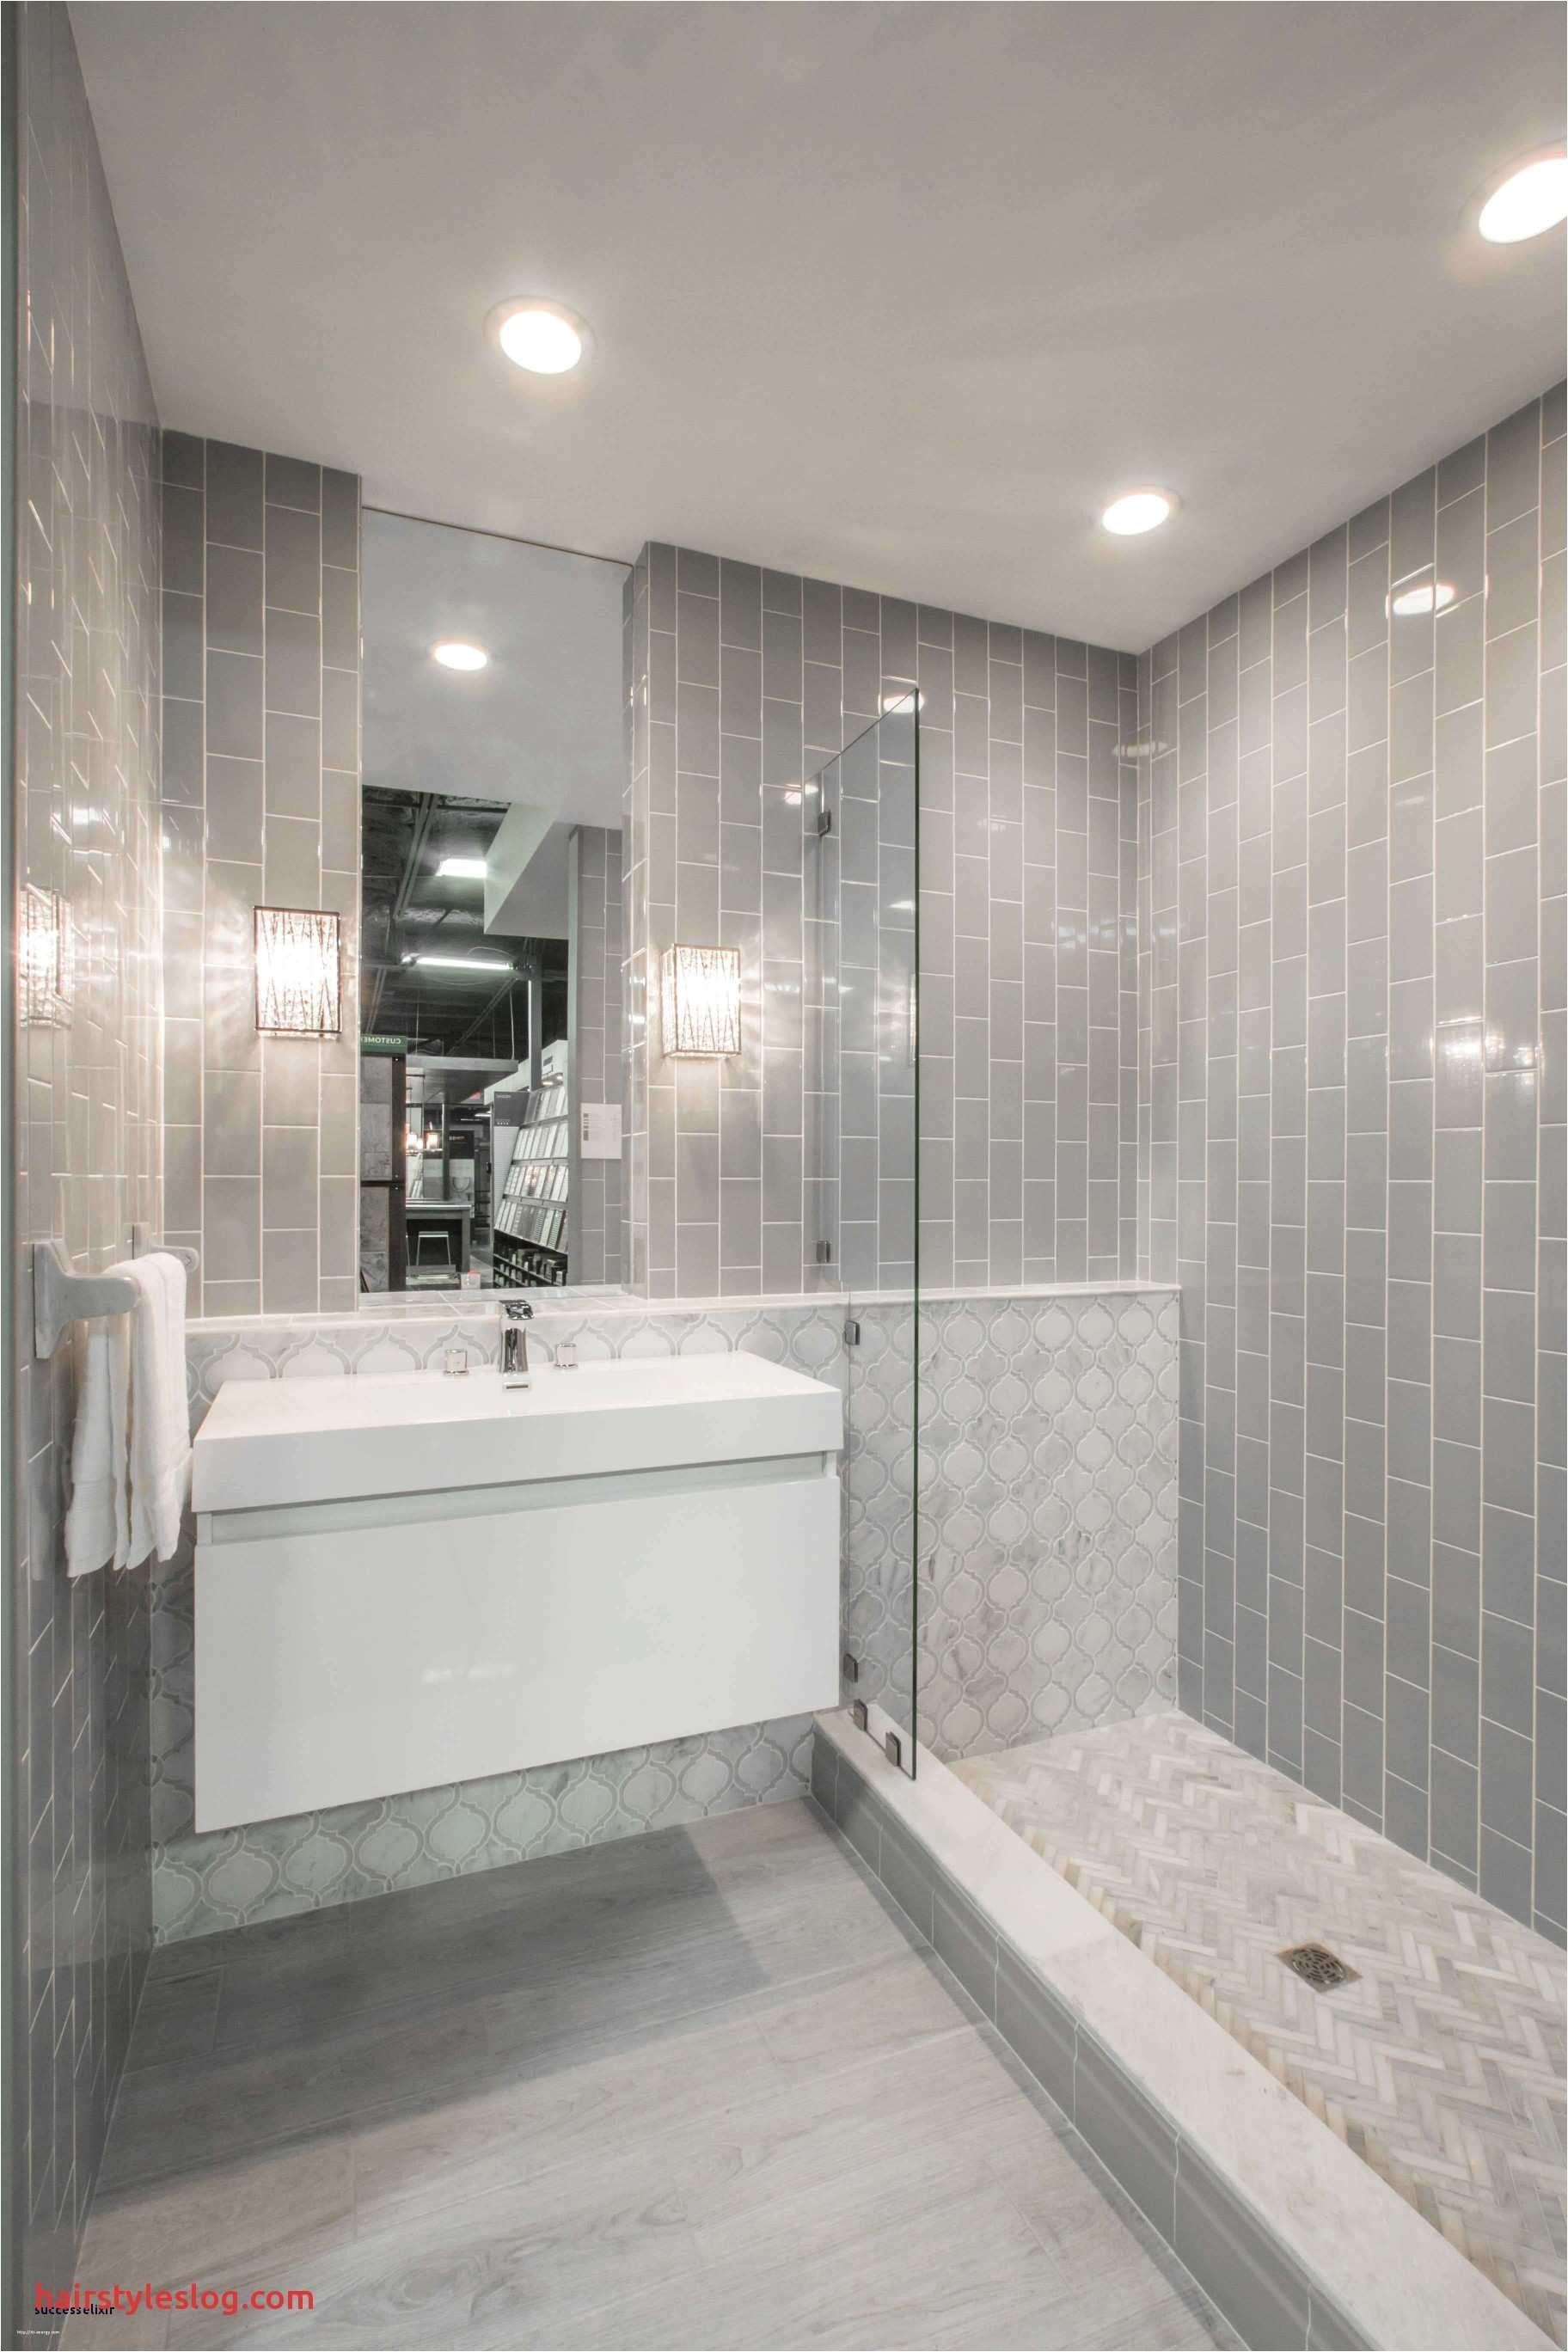 Virtual Bathroom Design Ideas Virtual Bathroom Design Ideas Intended for Home Regarding Household